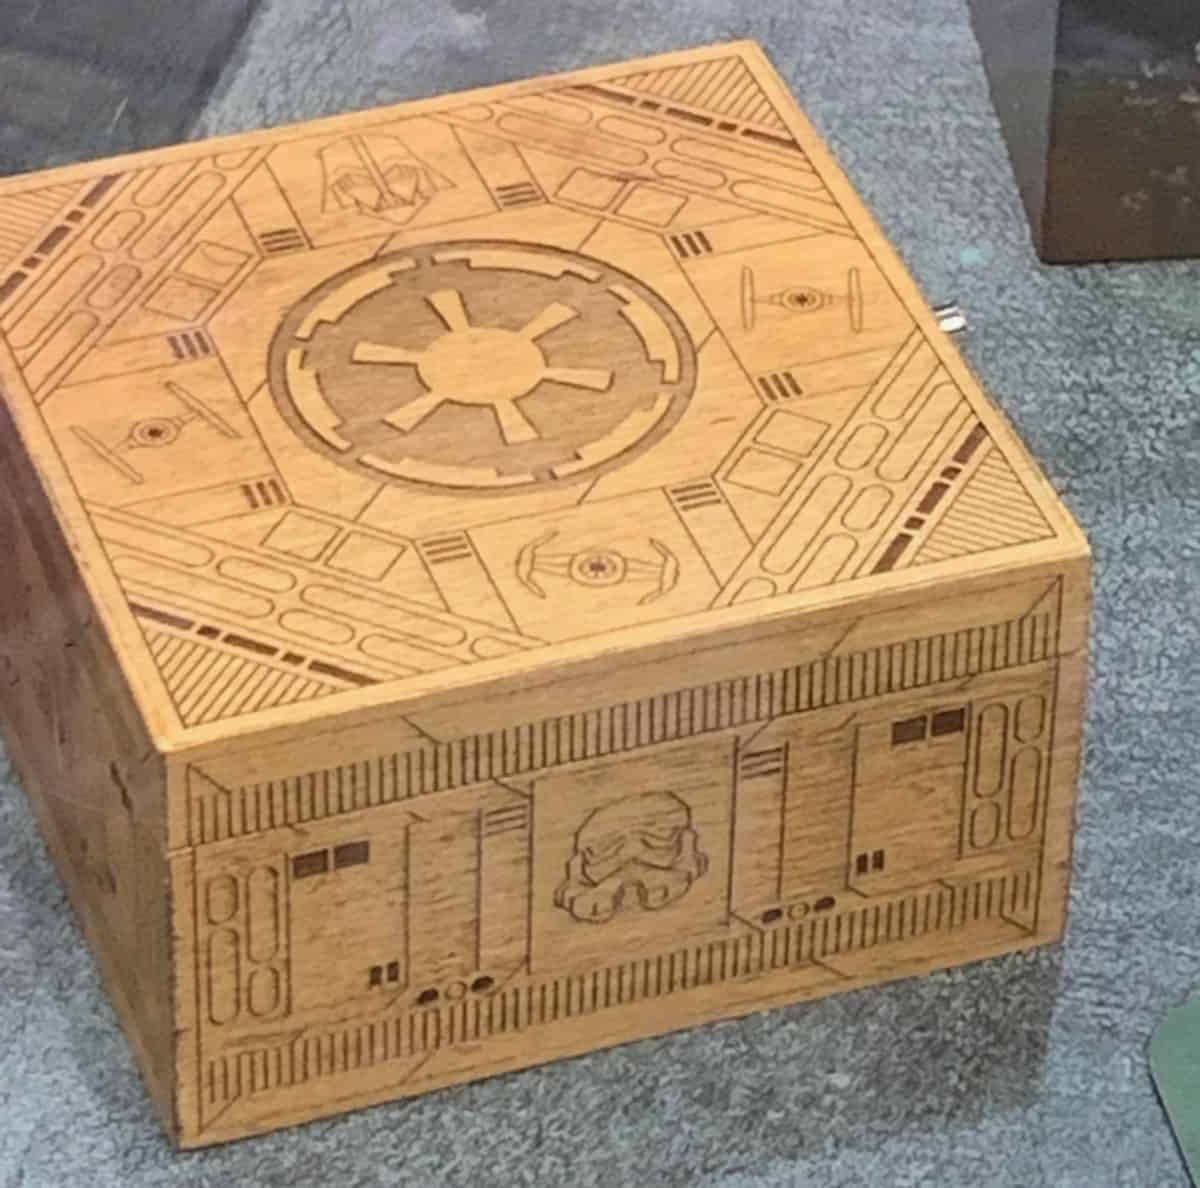 toydarian-toymaker-wooden-box-1200x1188.jpg